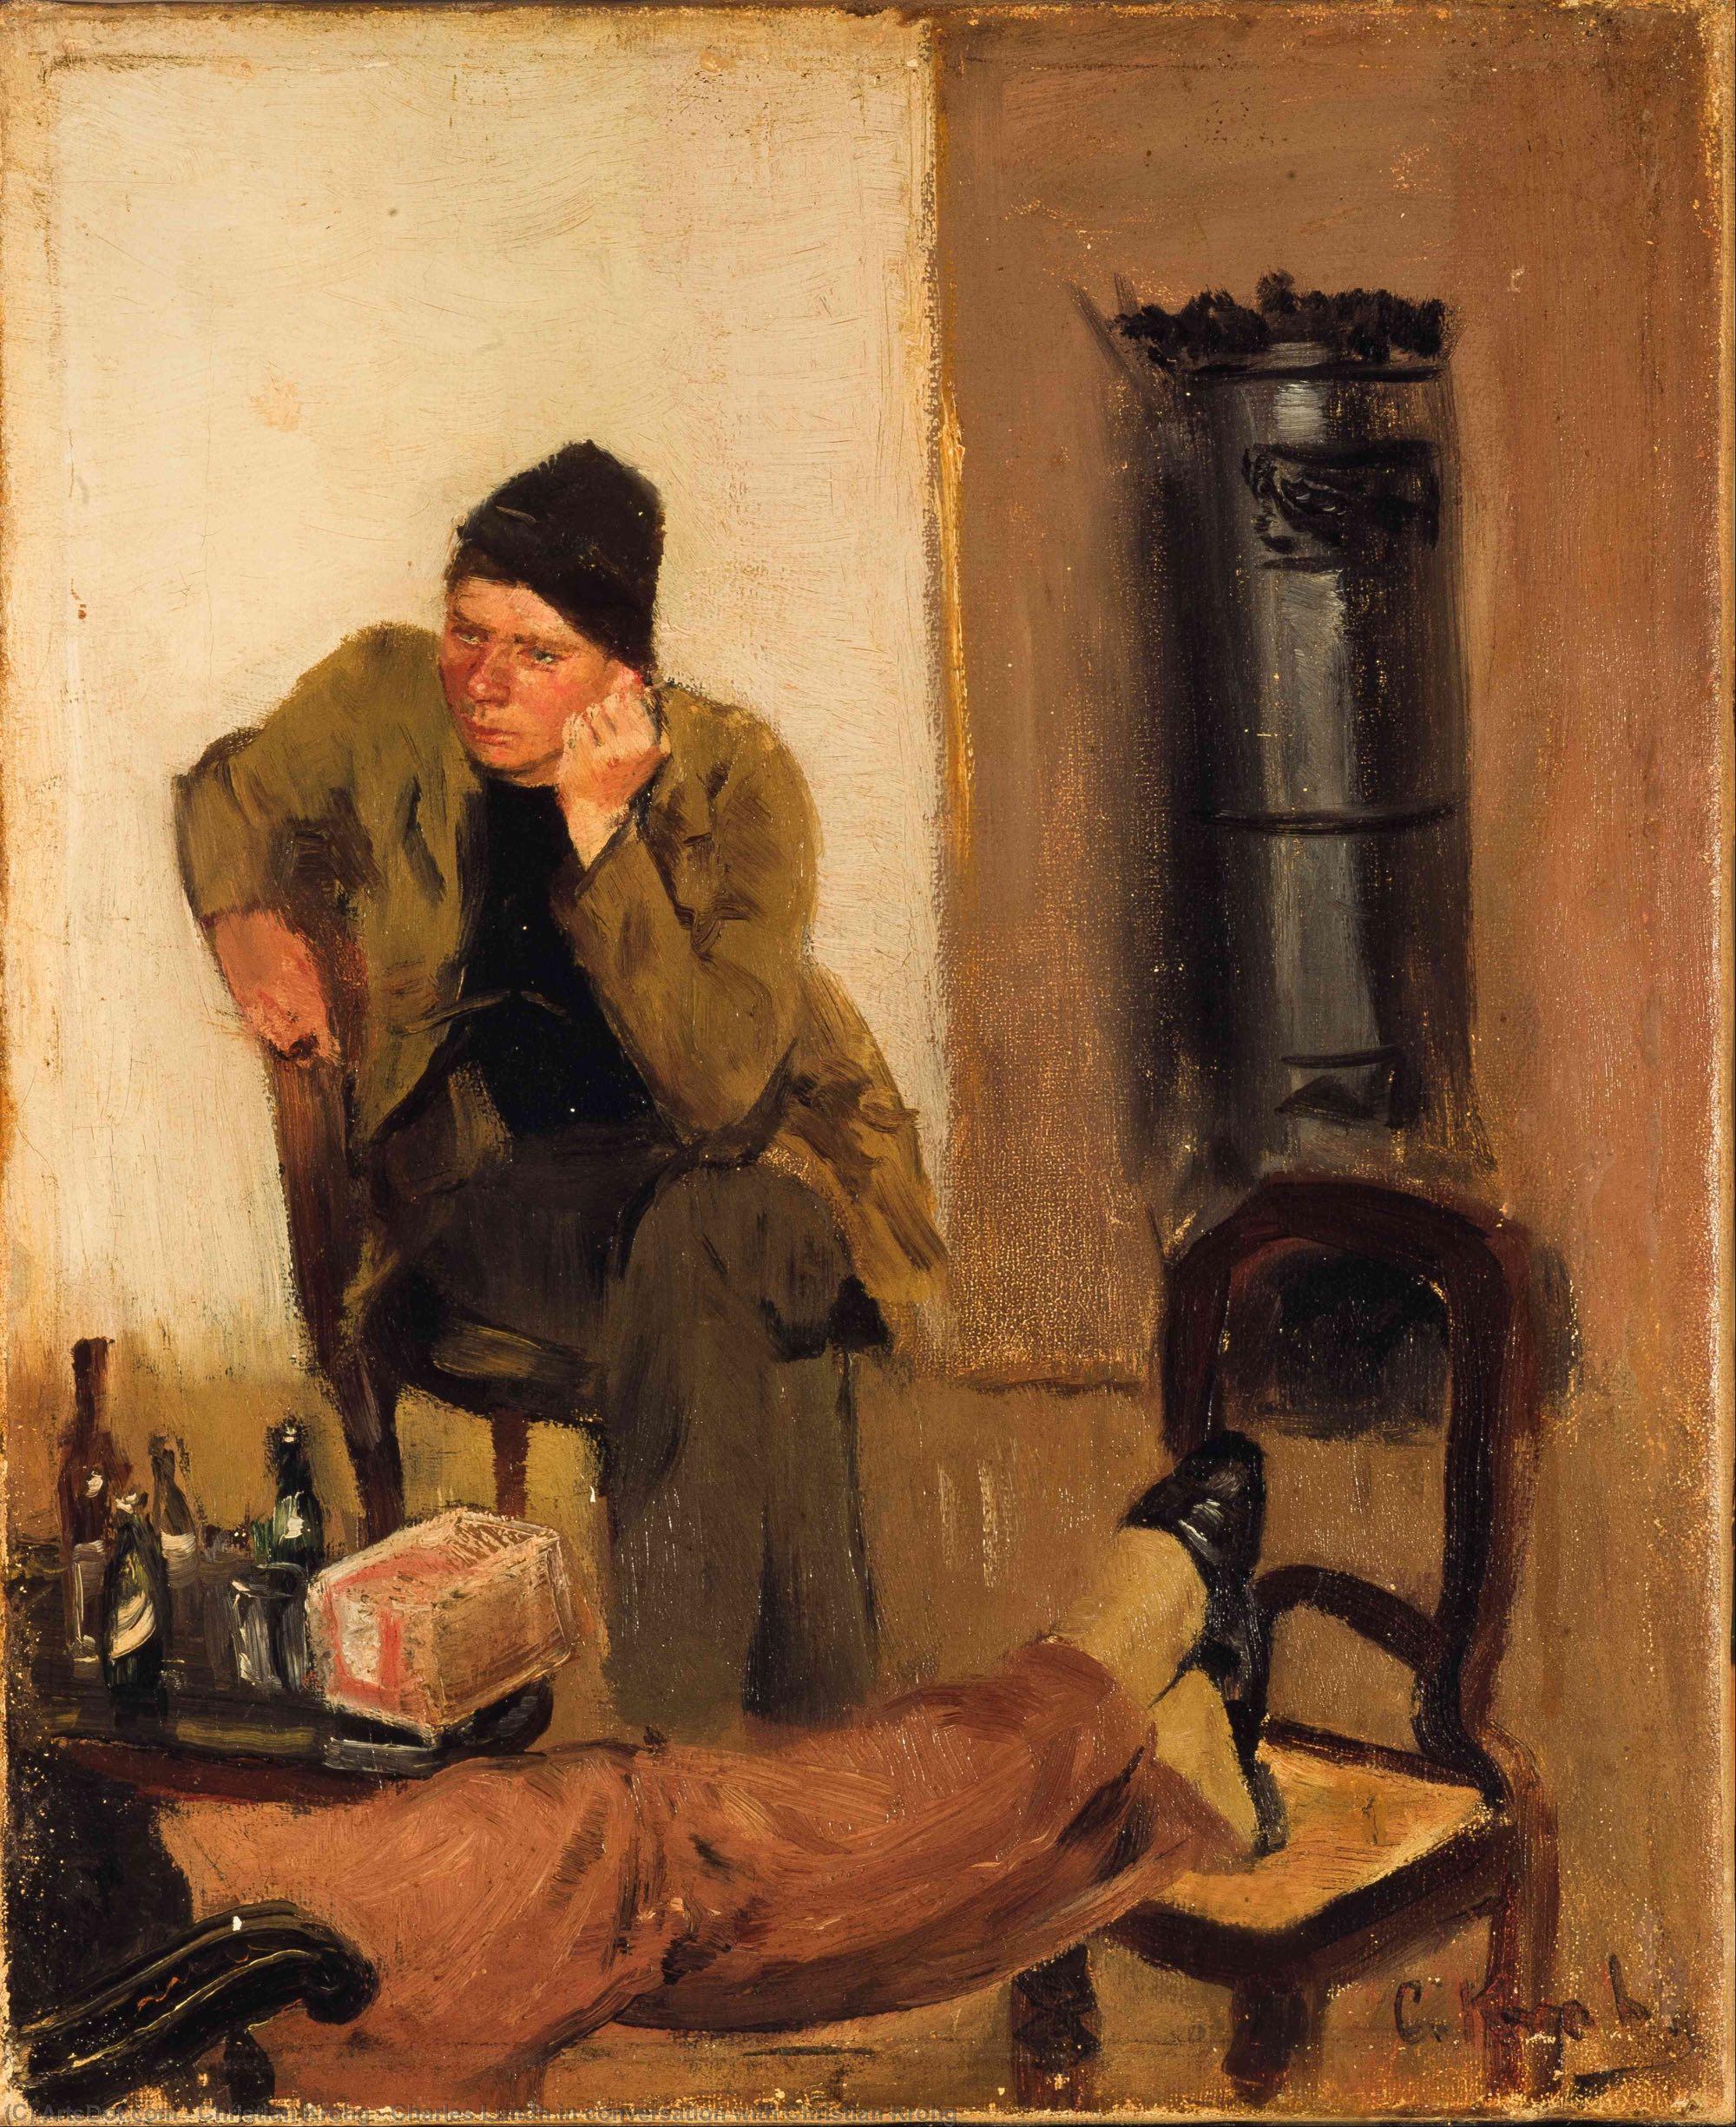 Charles Lundh en conversación con Christian Krohg (1883), de Christian Krohg